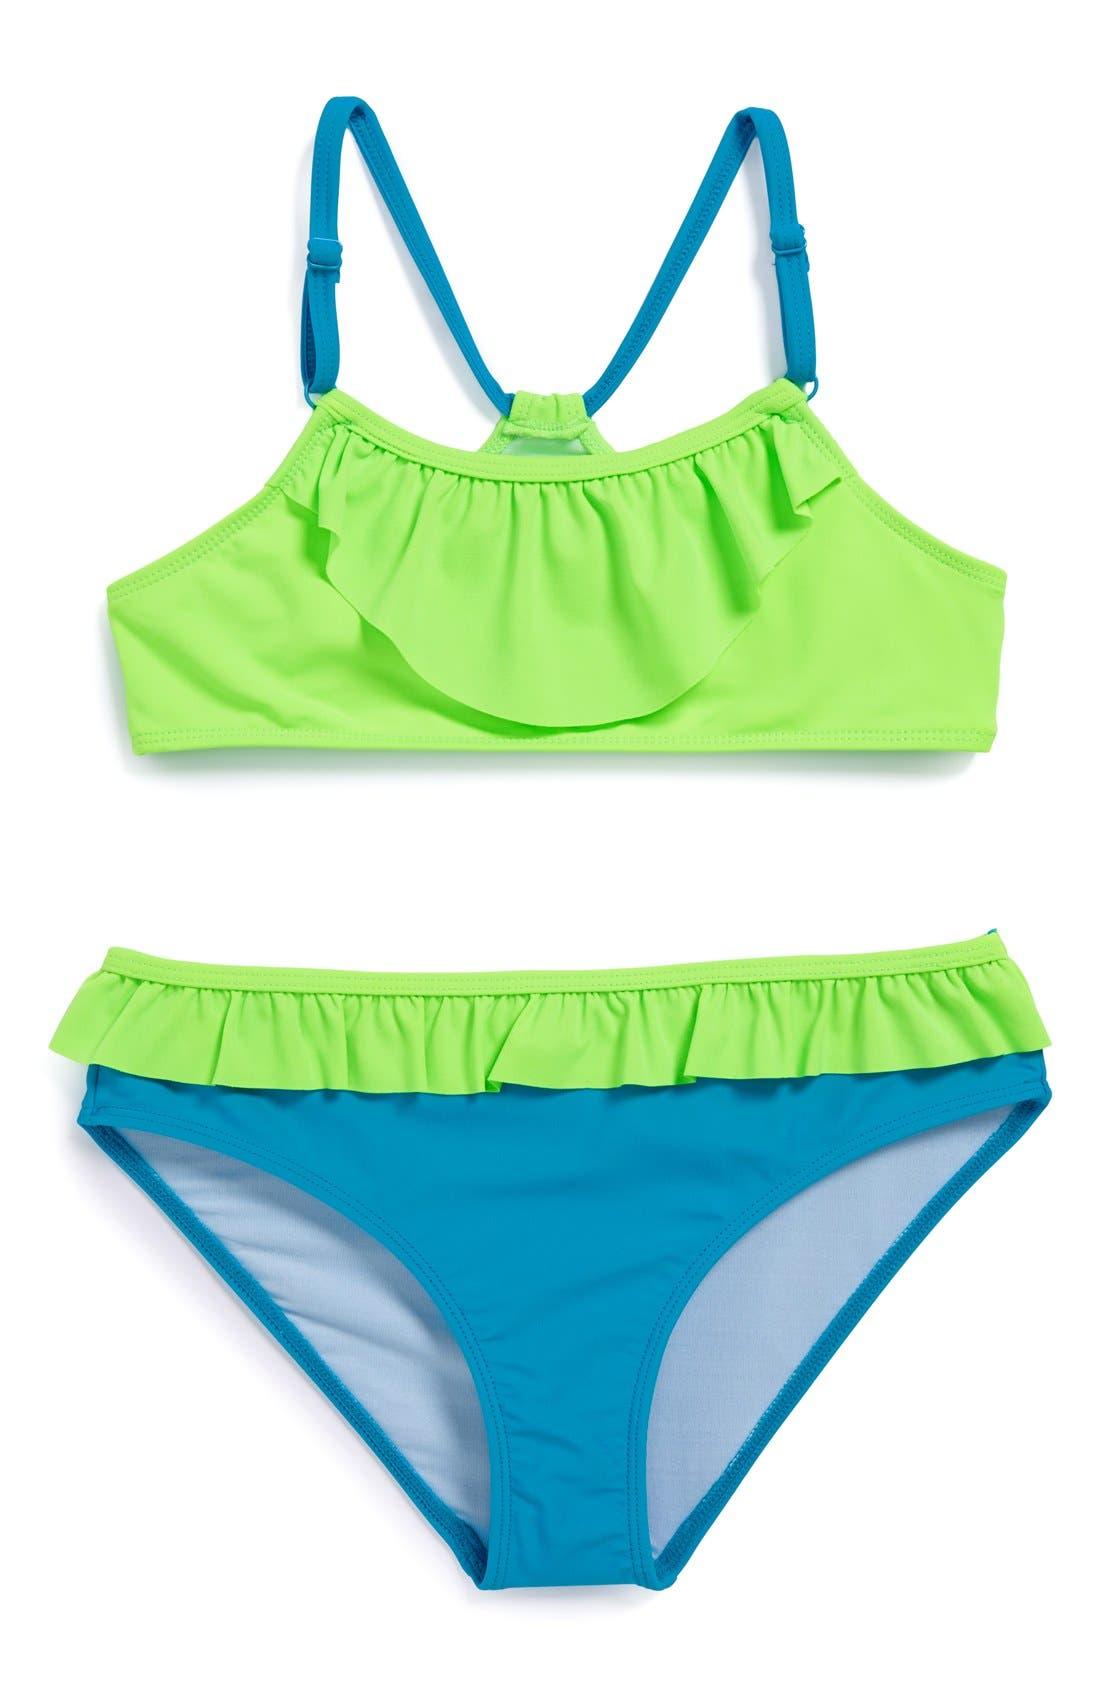 Main Image - Tucker + Tate 'Sunny' Two-Piece Swimsuit (Little Girls & Big Girls)